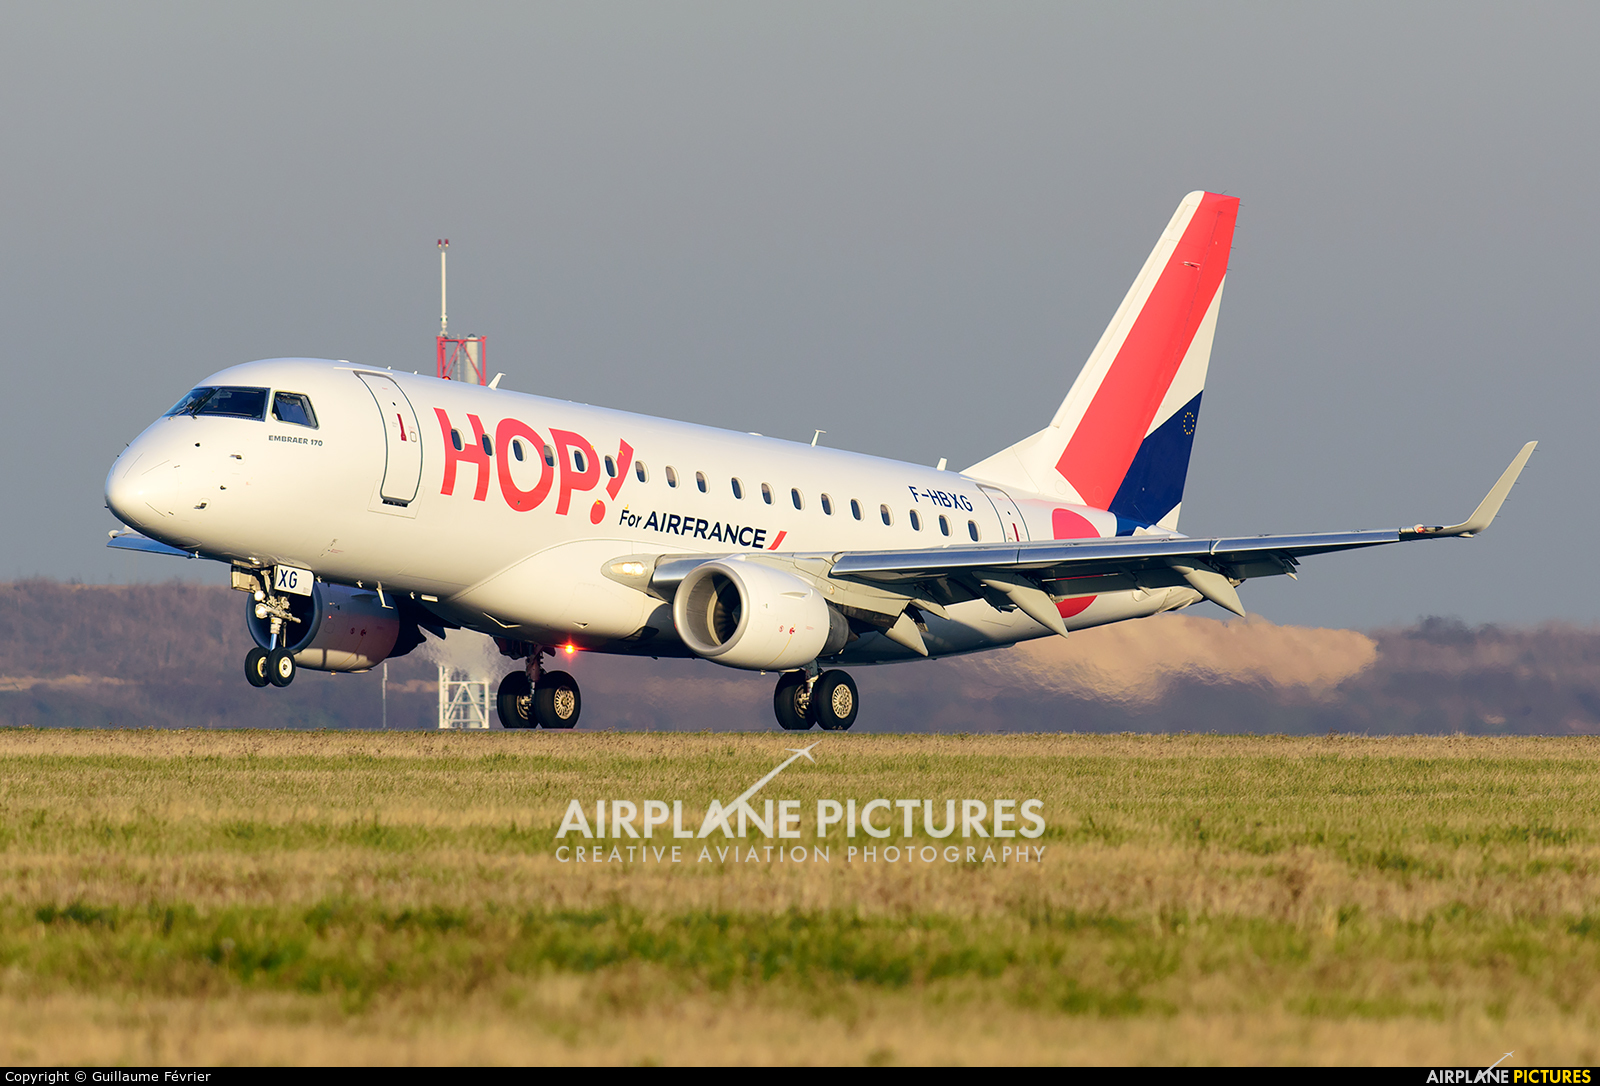 Air France - Hop! F-HBXG aircraft at Paris - Charles de Gaulle